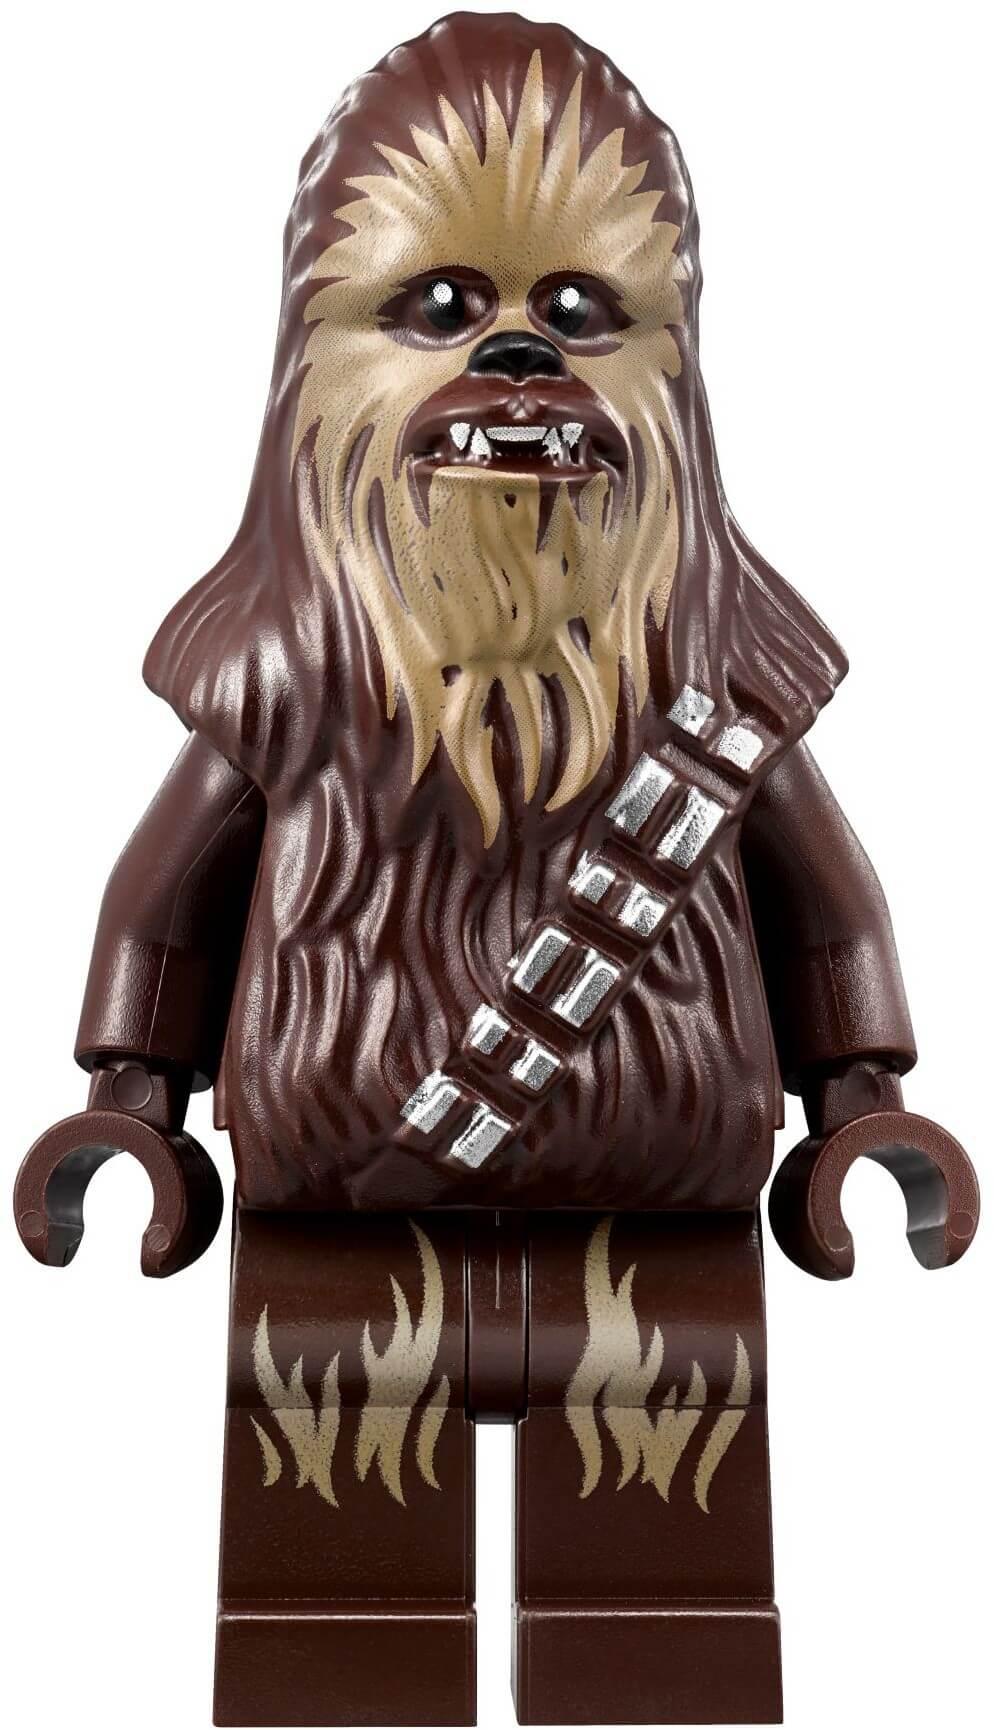 Mua đồ chơi LEGO 75193 - LEGO Star Wars 75193 - Phi Thuyền Millennium Falcon (LEGO Star Wars 75193 Millennium Falcon Microfighter)